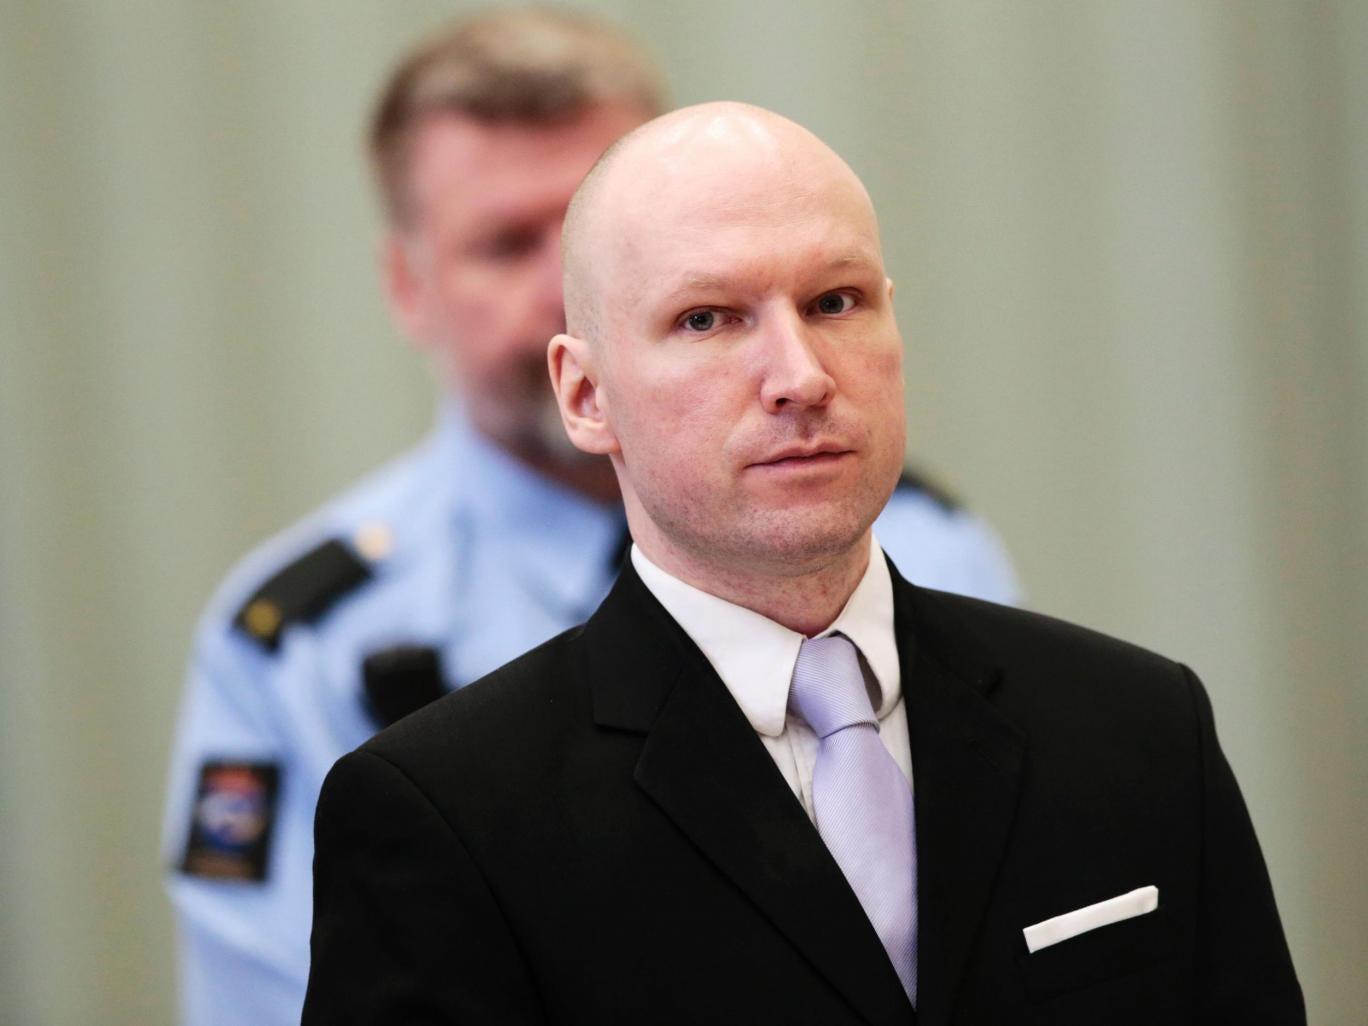 Anders Breivik, Norwegian shooter: biography, life in prison 34